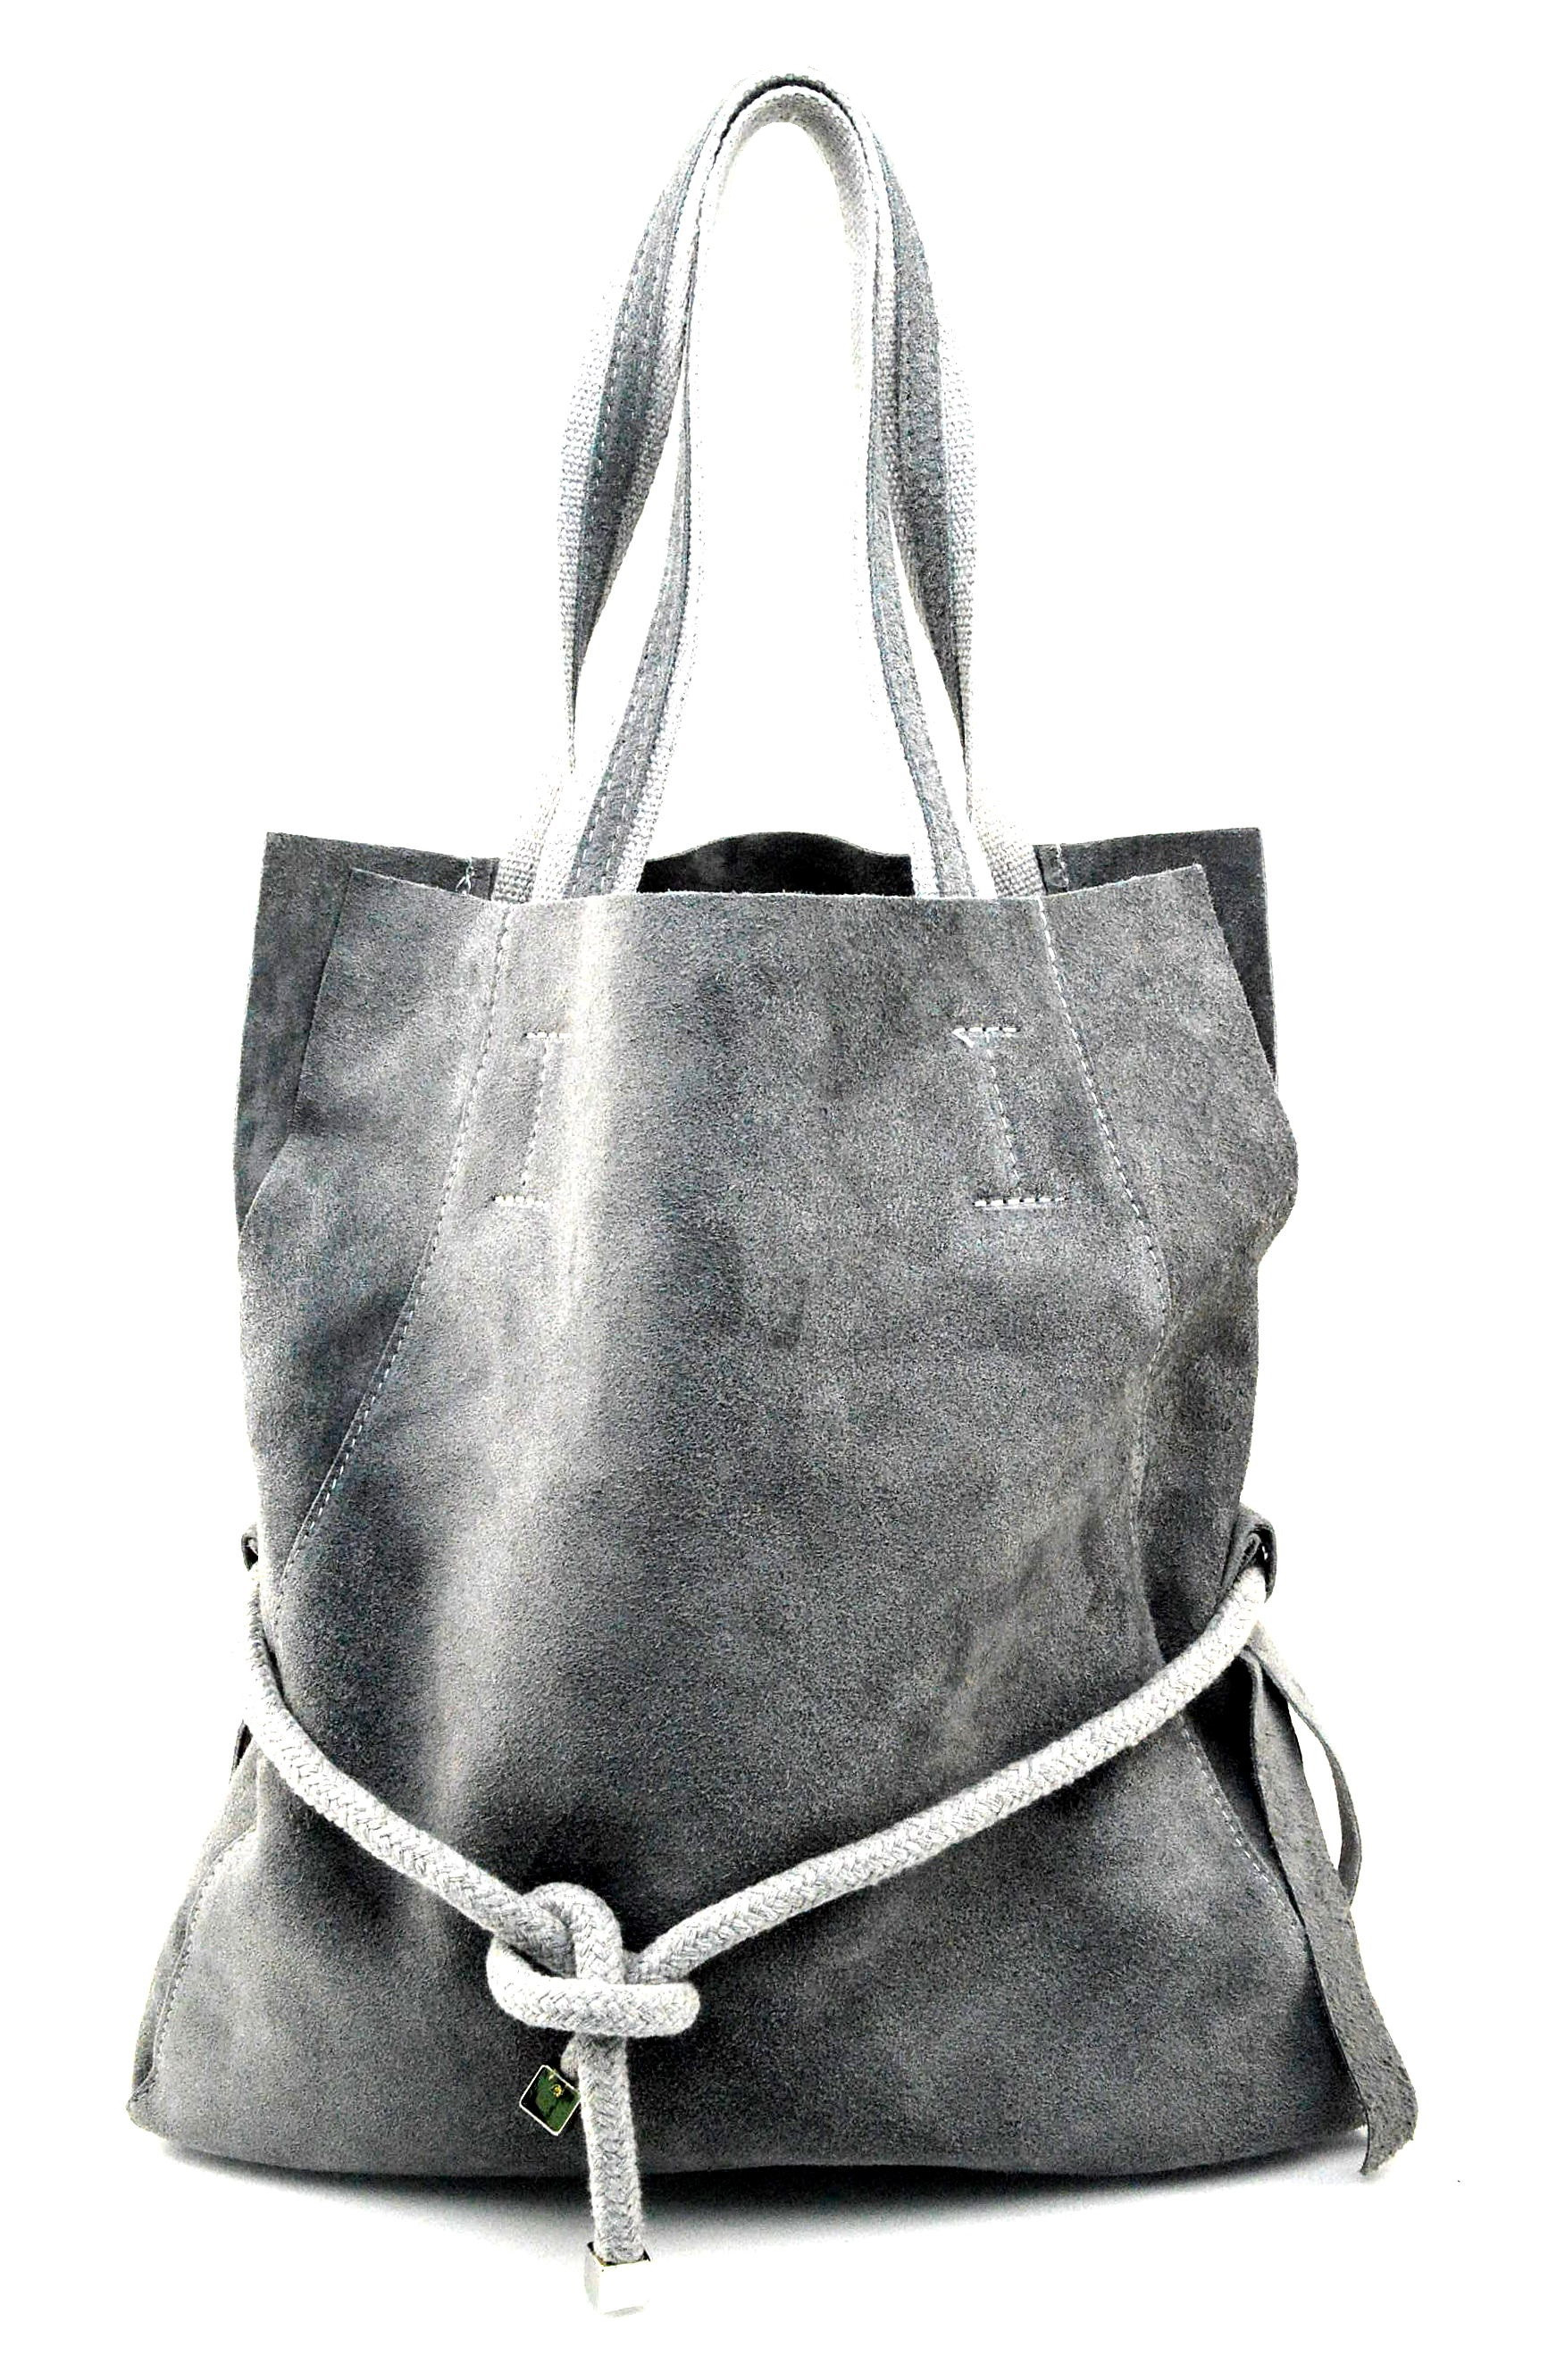 Kožená světle šedá velká shopper taška na rameno claudia